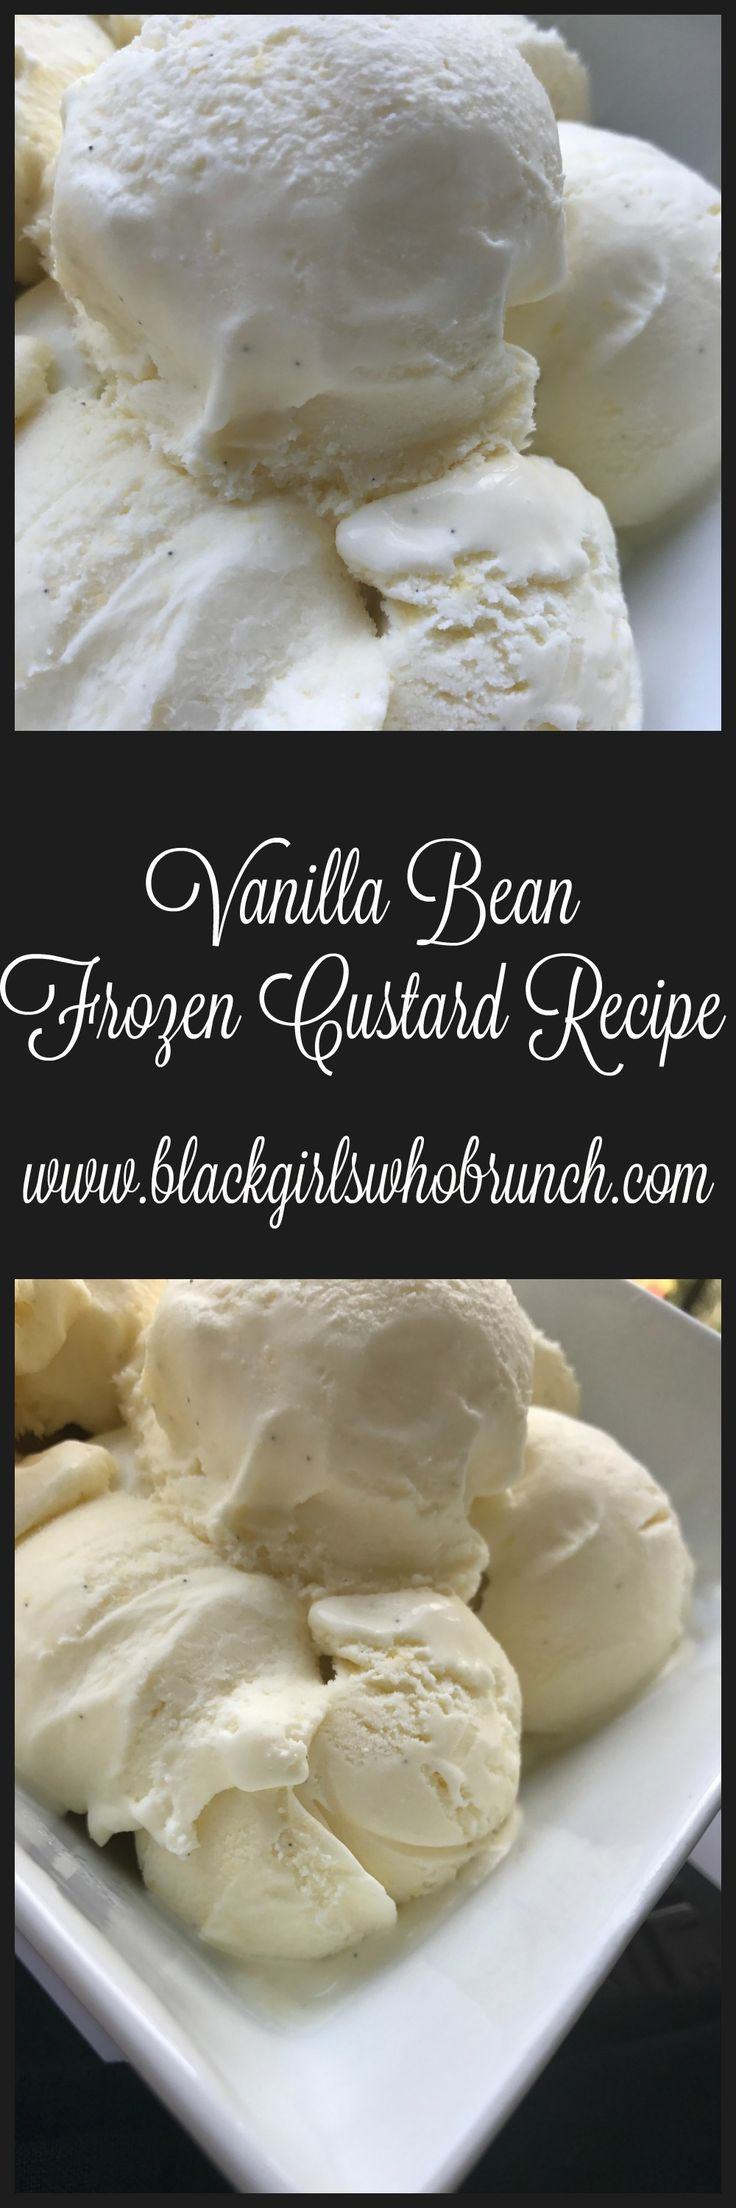 Vanilla Bean Frozen Custard Recipe Black Girls Who Brunch